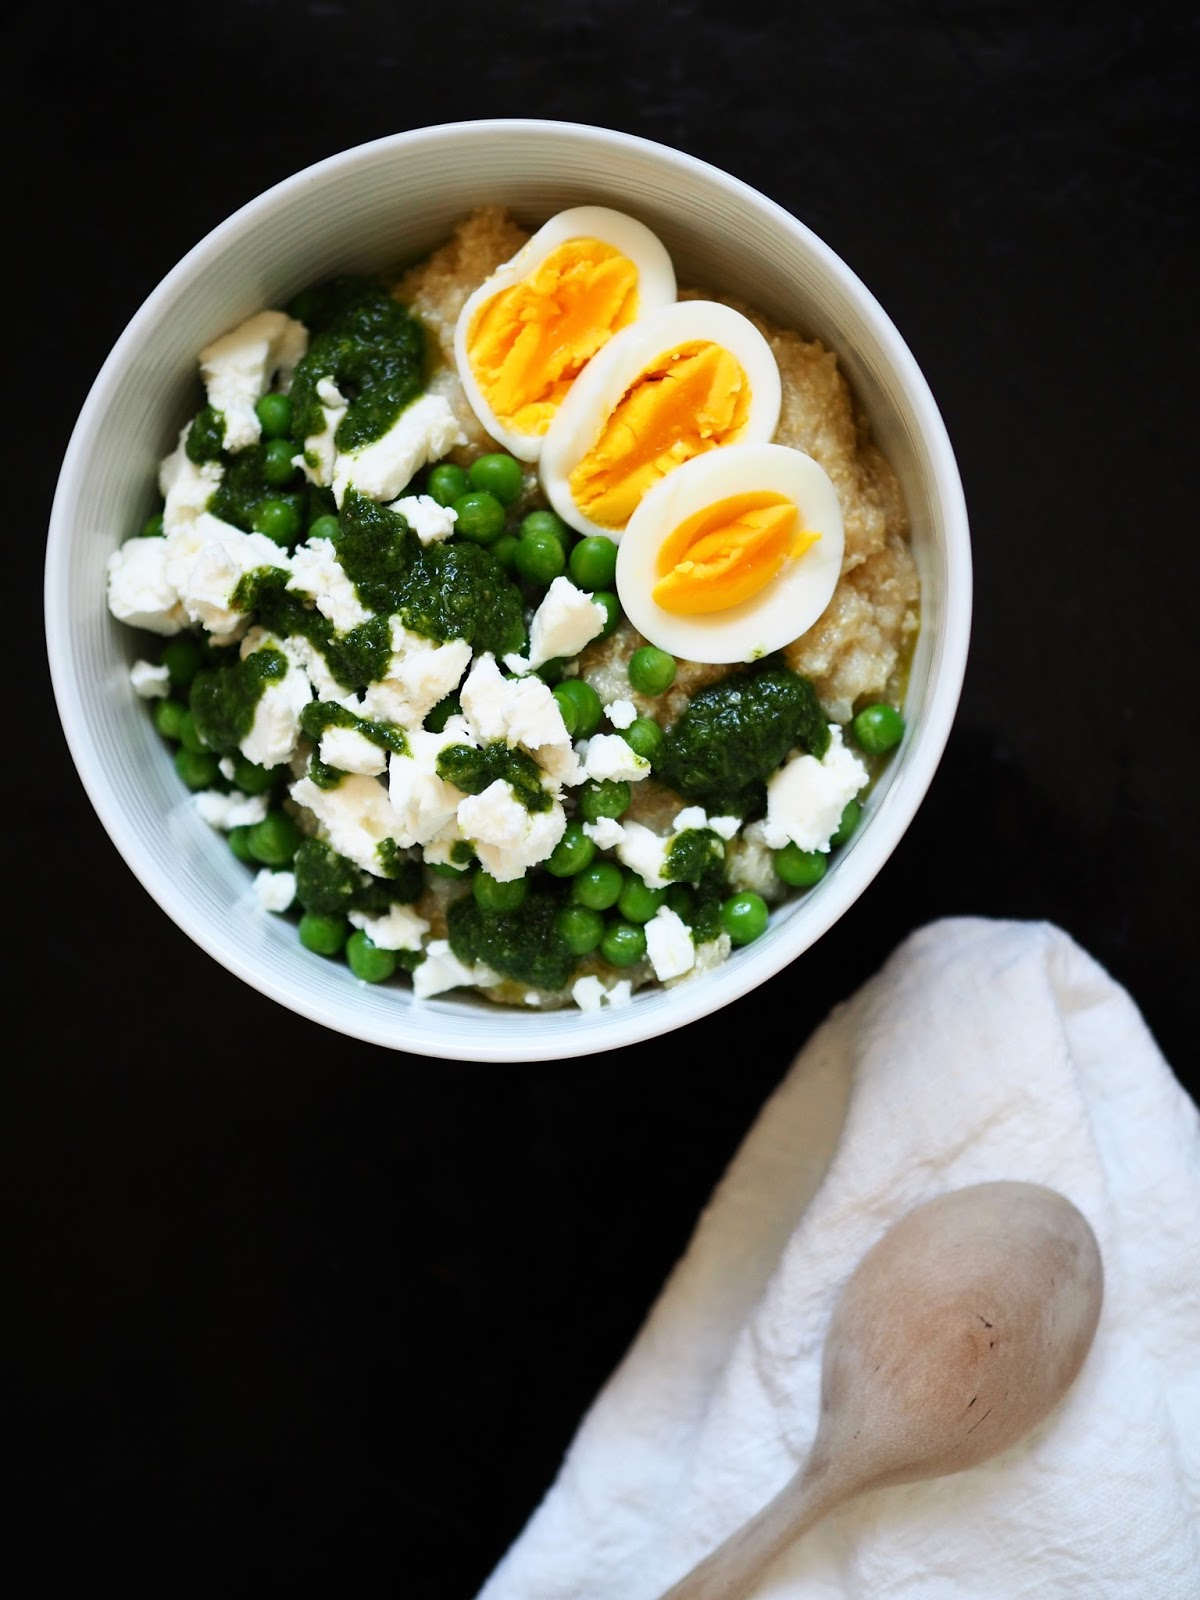 Savory porridge, suolainen puuro, suolainen kvinoapuuro, savory quinoa porridge, quinoapuuro